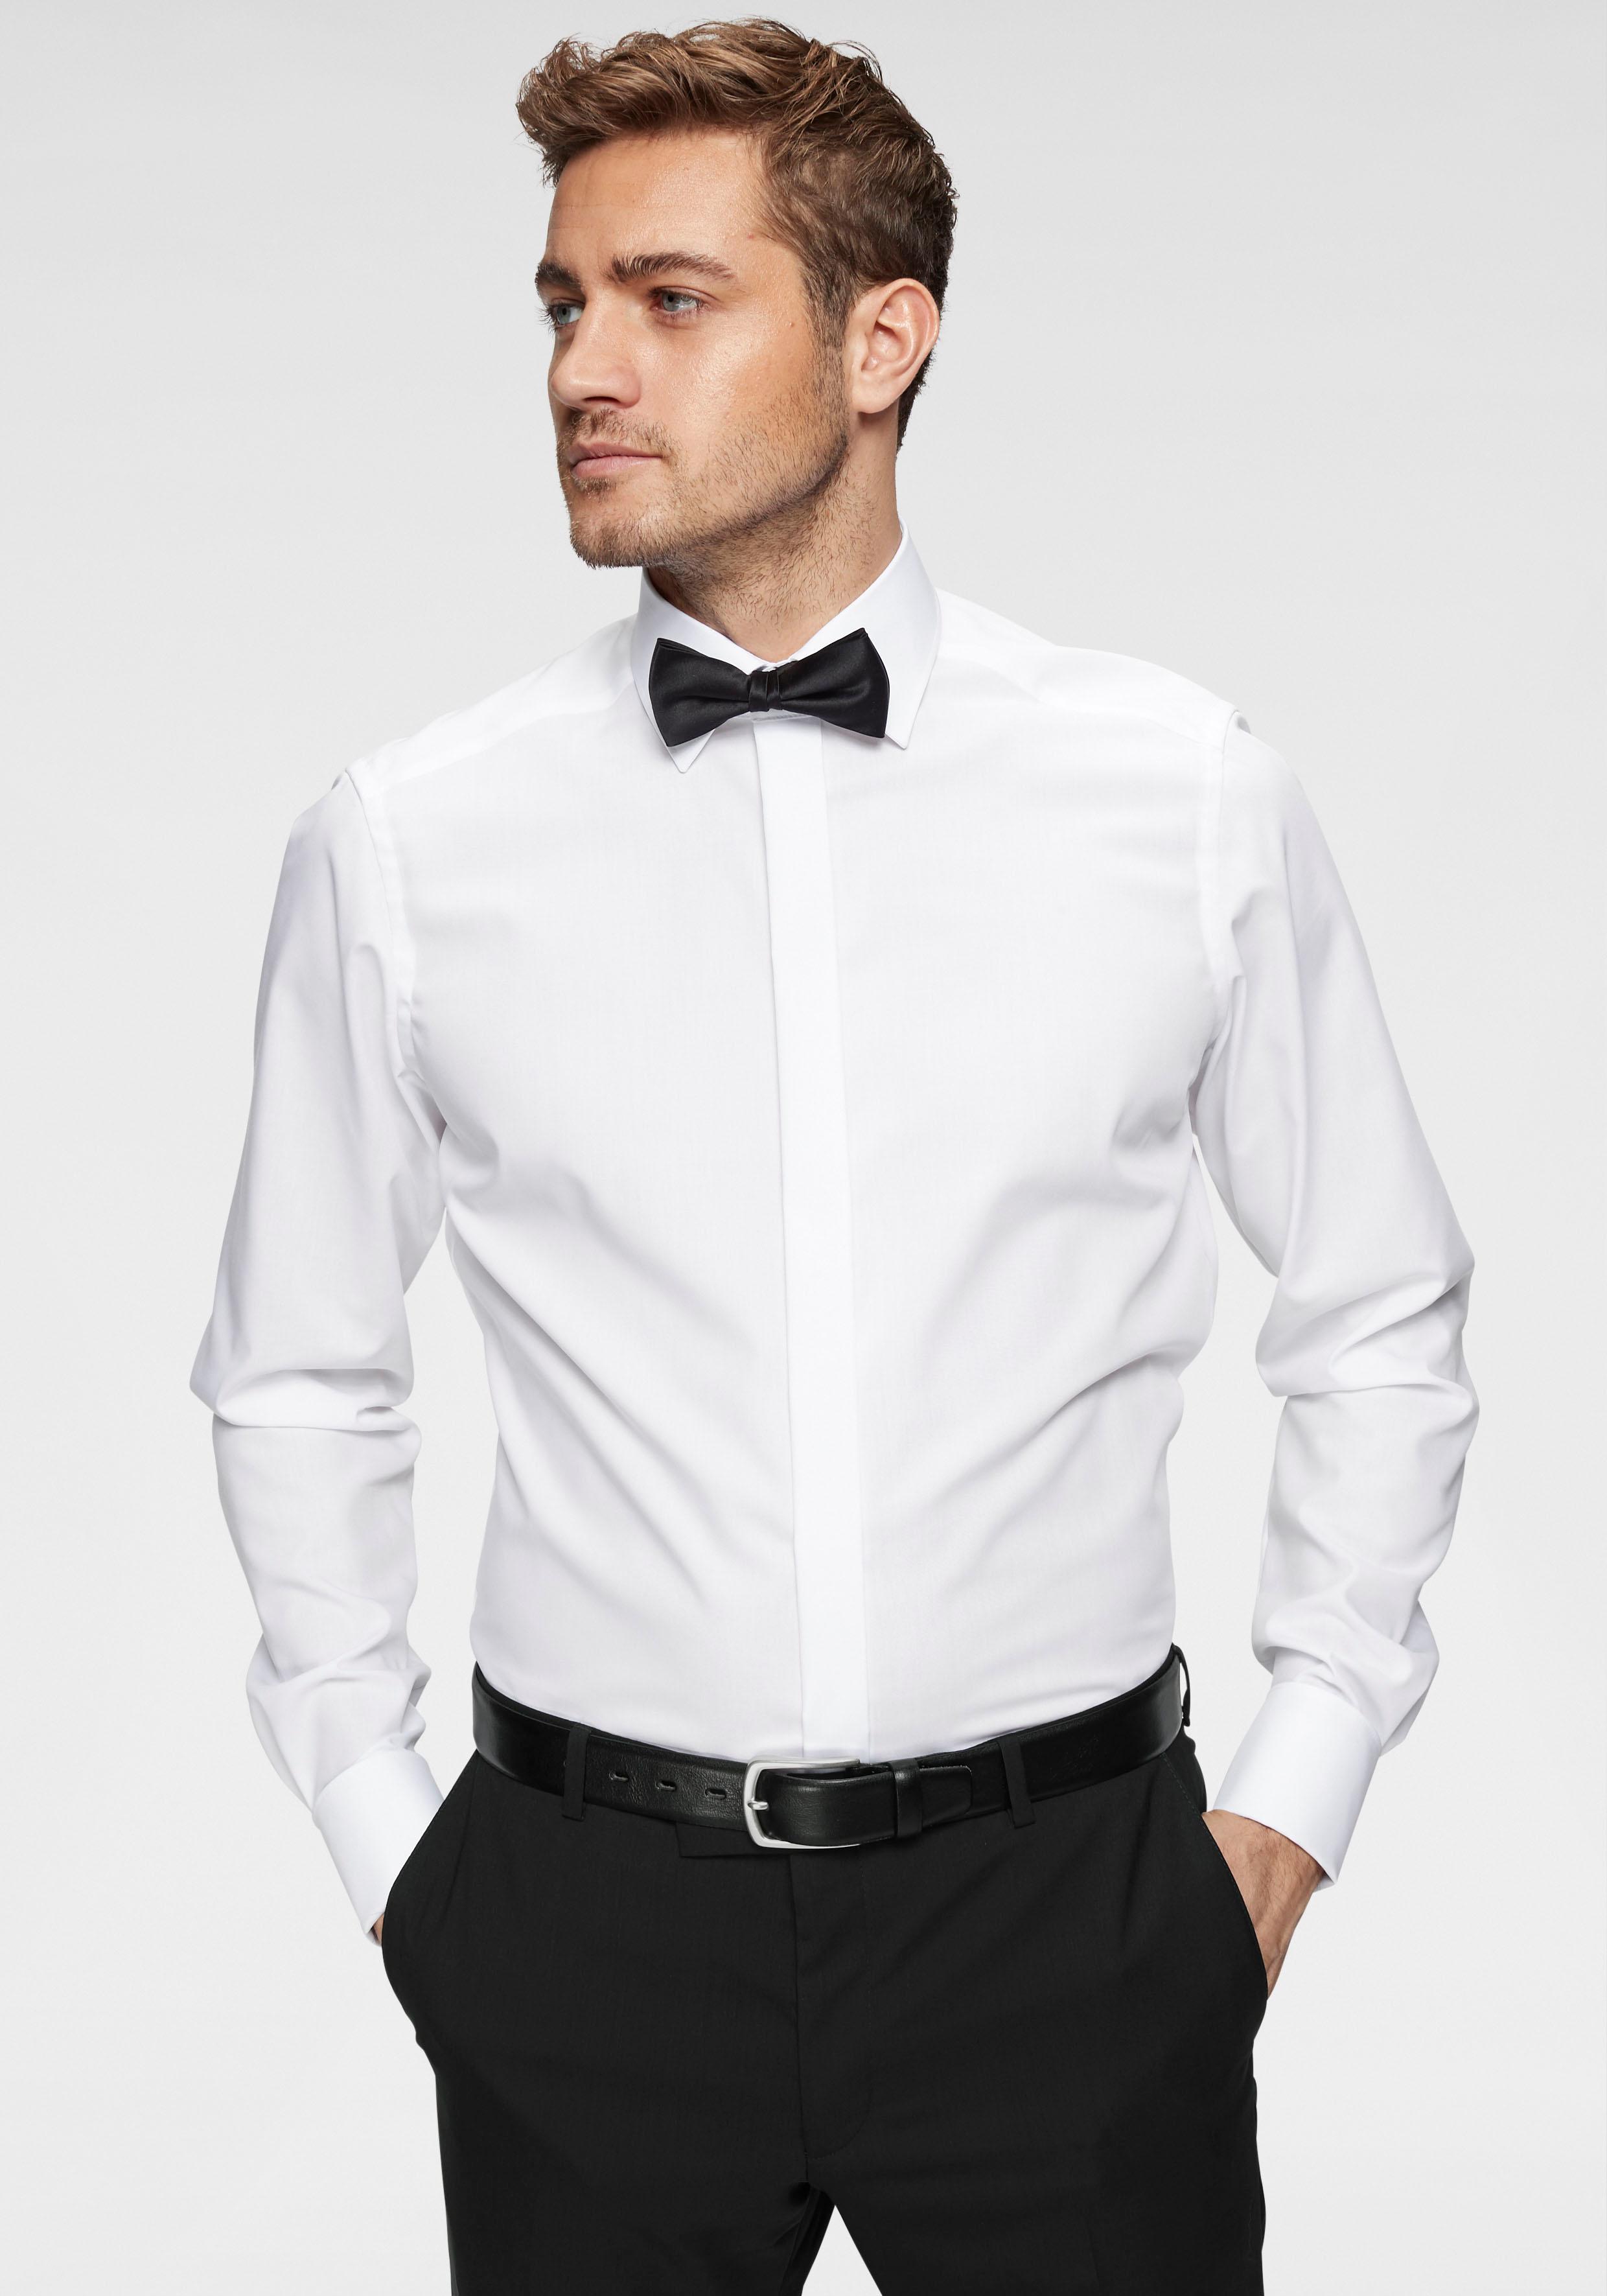 OLYMP Smokinghemd »Luxor modern fit«   Bekleidung > Anzüge & Smokings > Smokings   Weiß   OLYMP